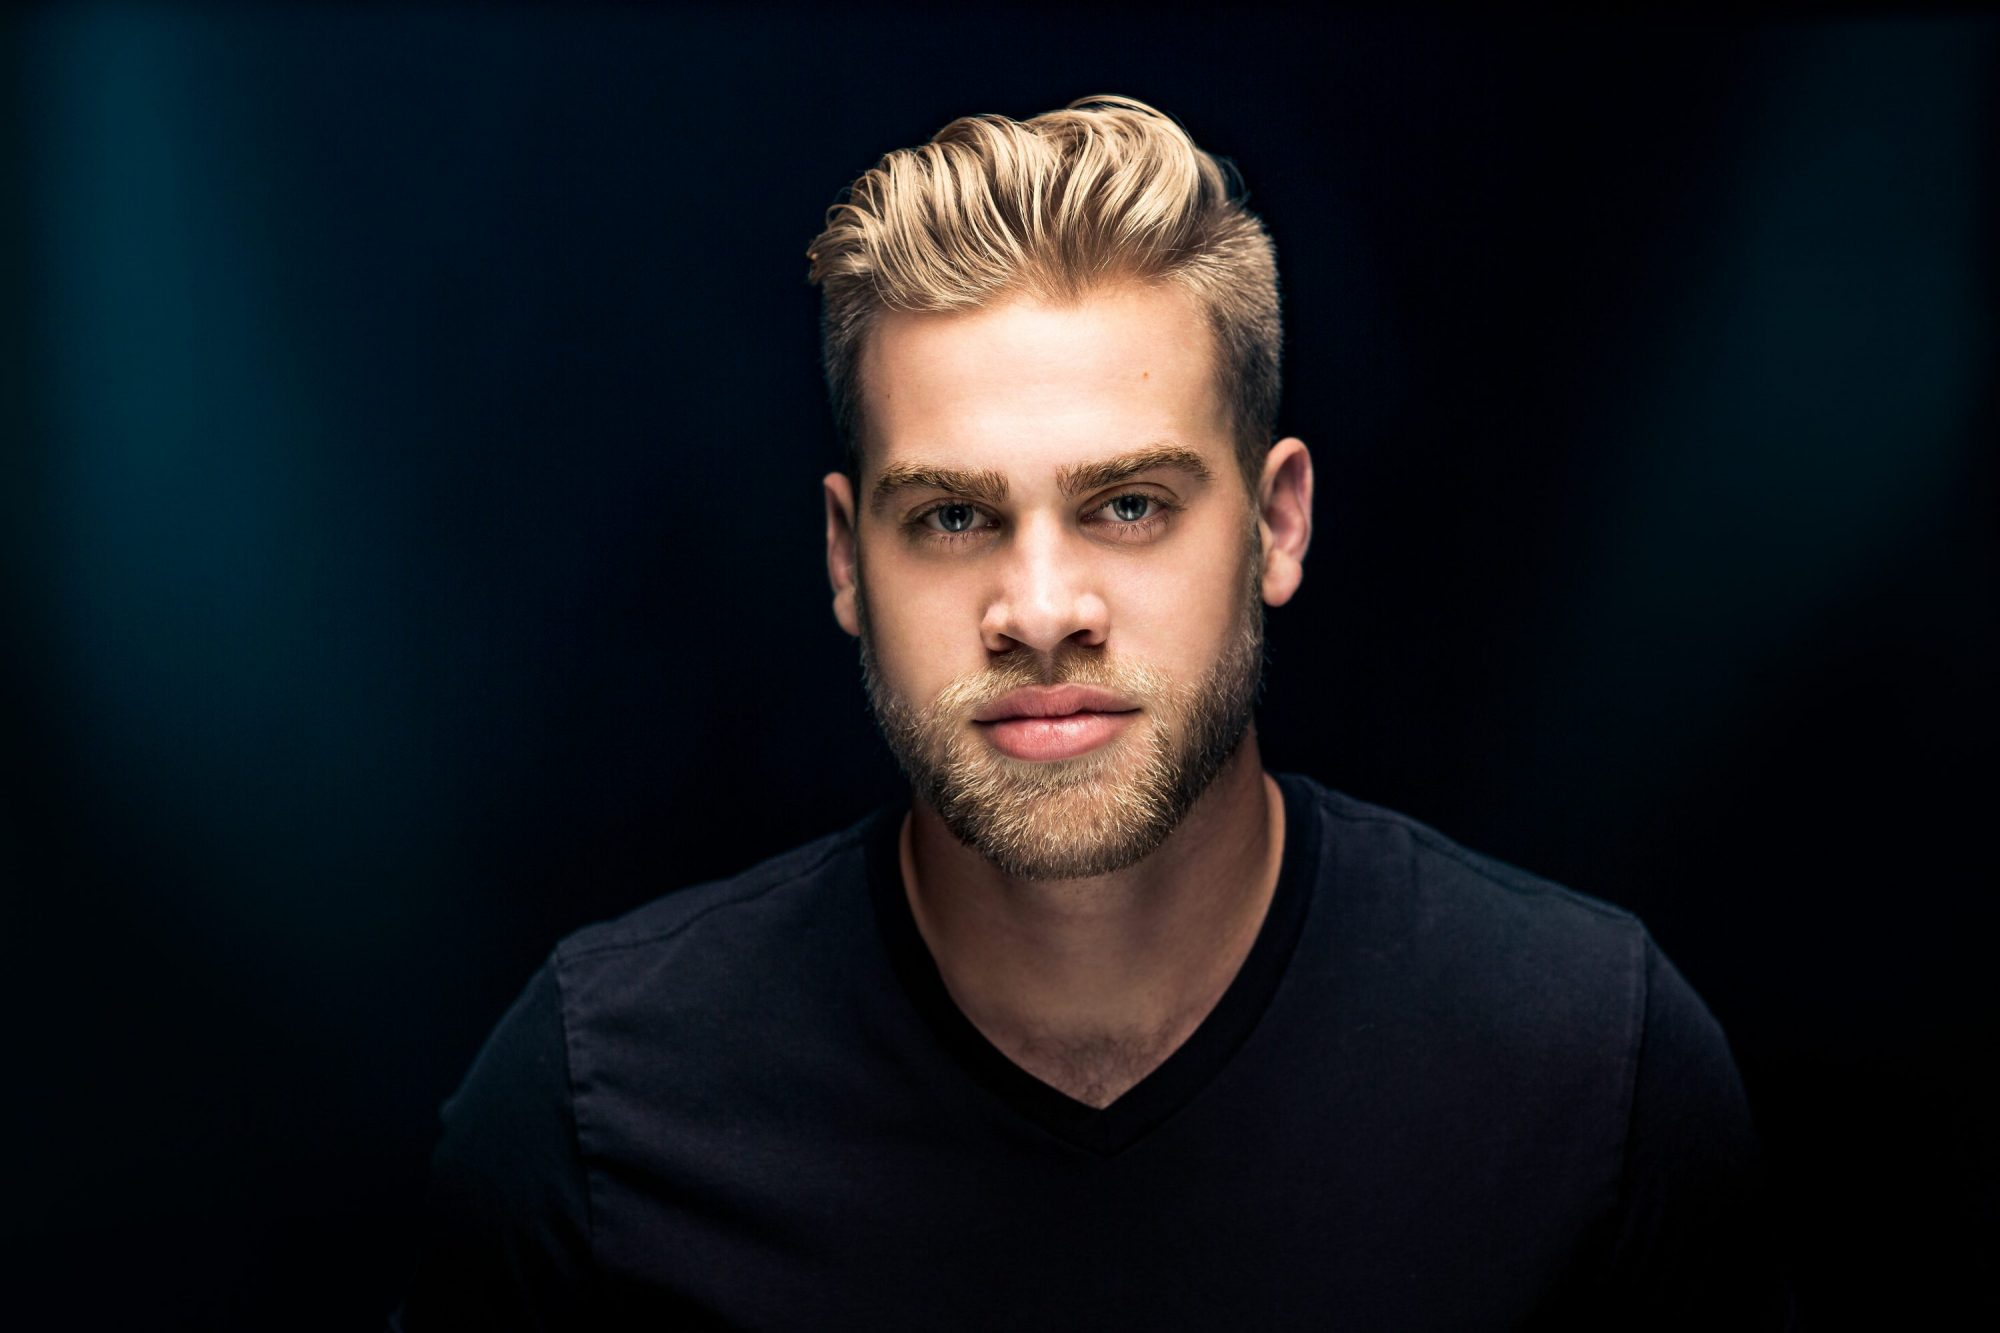 Actor Headshot, Male Model, Studio, Columbus, Ohio, Photography, Portrait, Epic Lighting